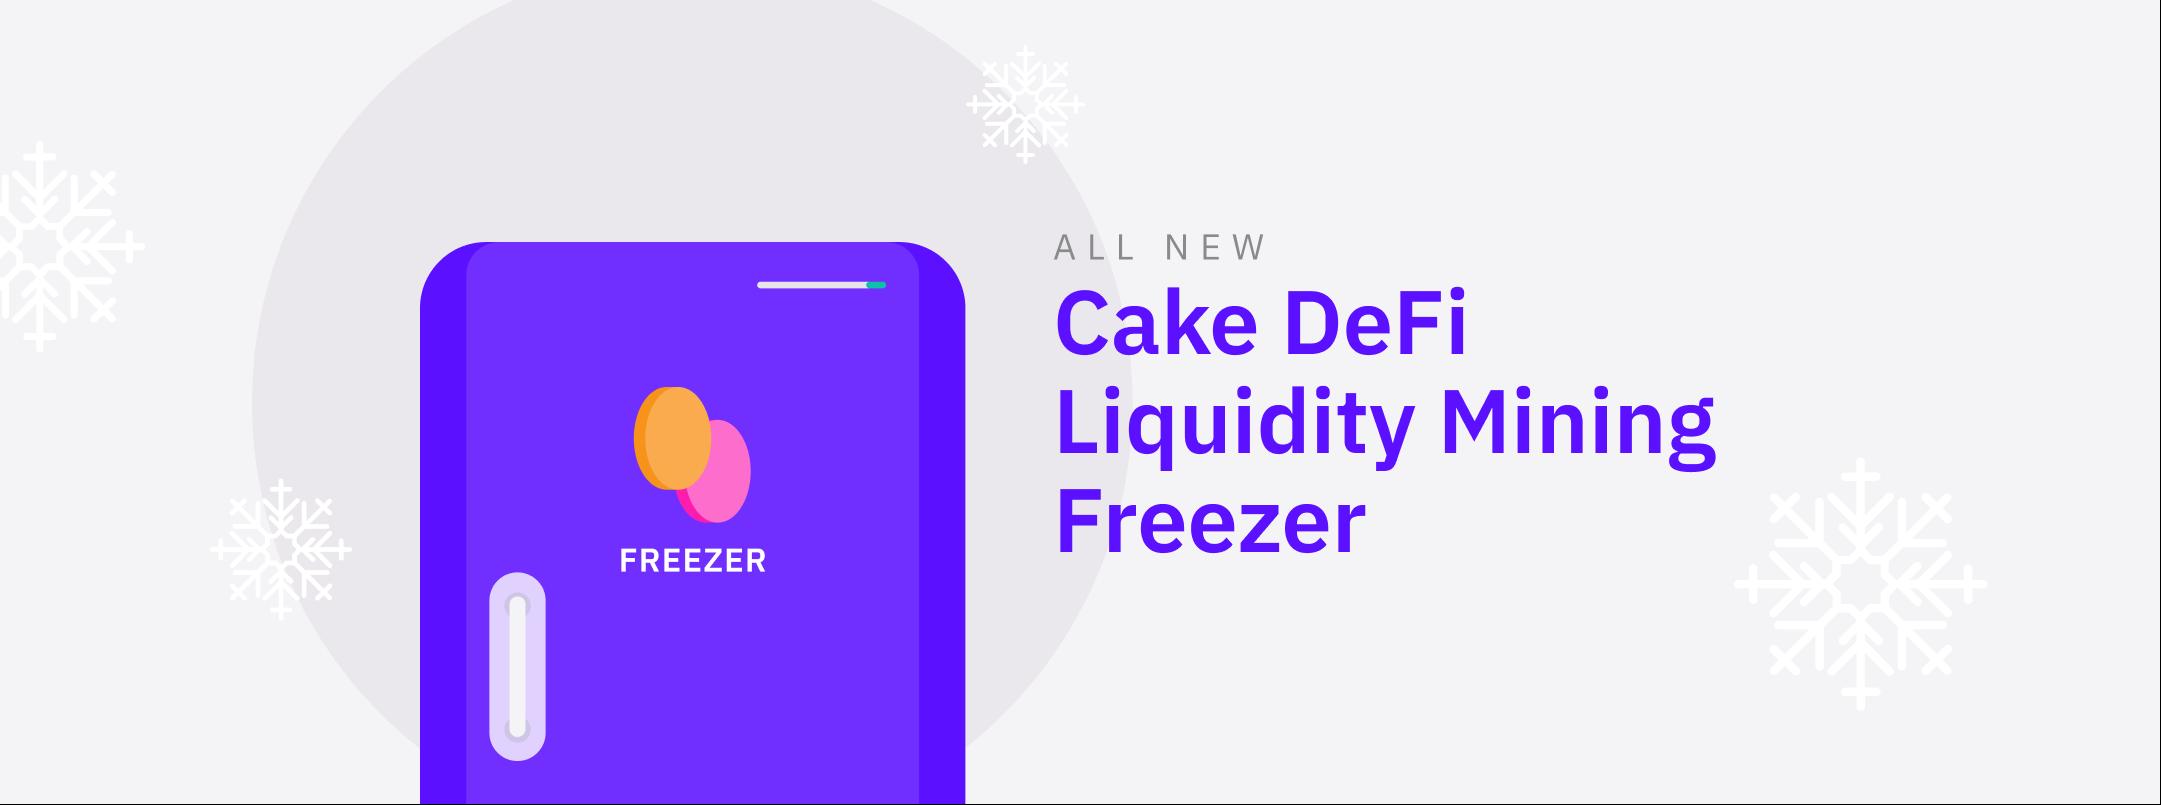 The All New Liquidity Mining Freezer